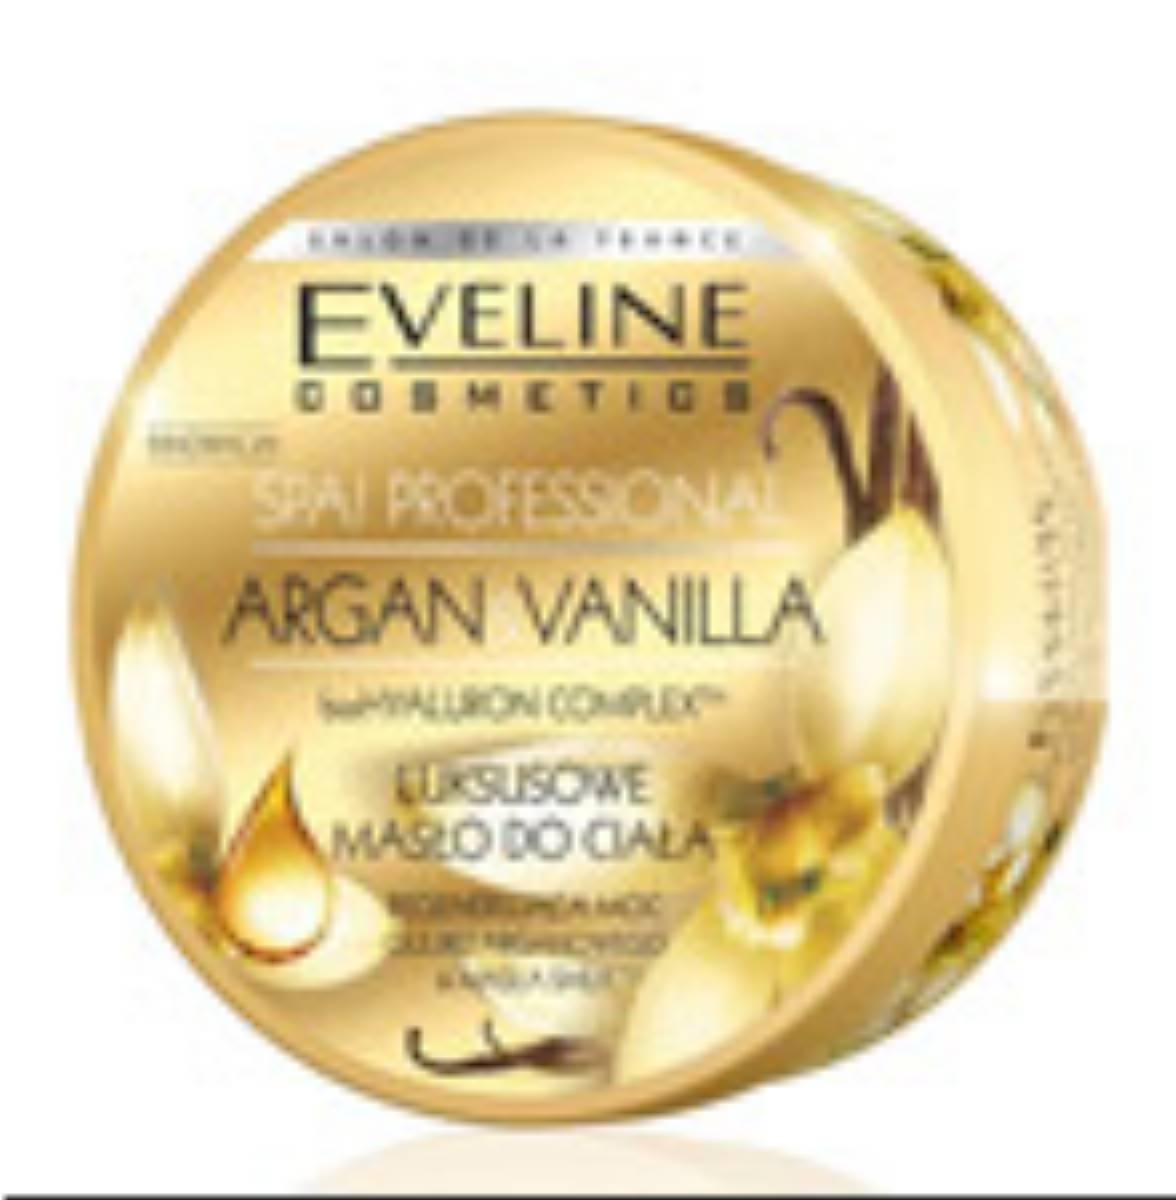 maslo-do-ciala_Argan_Vanilla--Eveline-Cosmetics_min